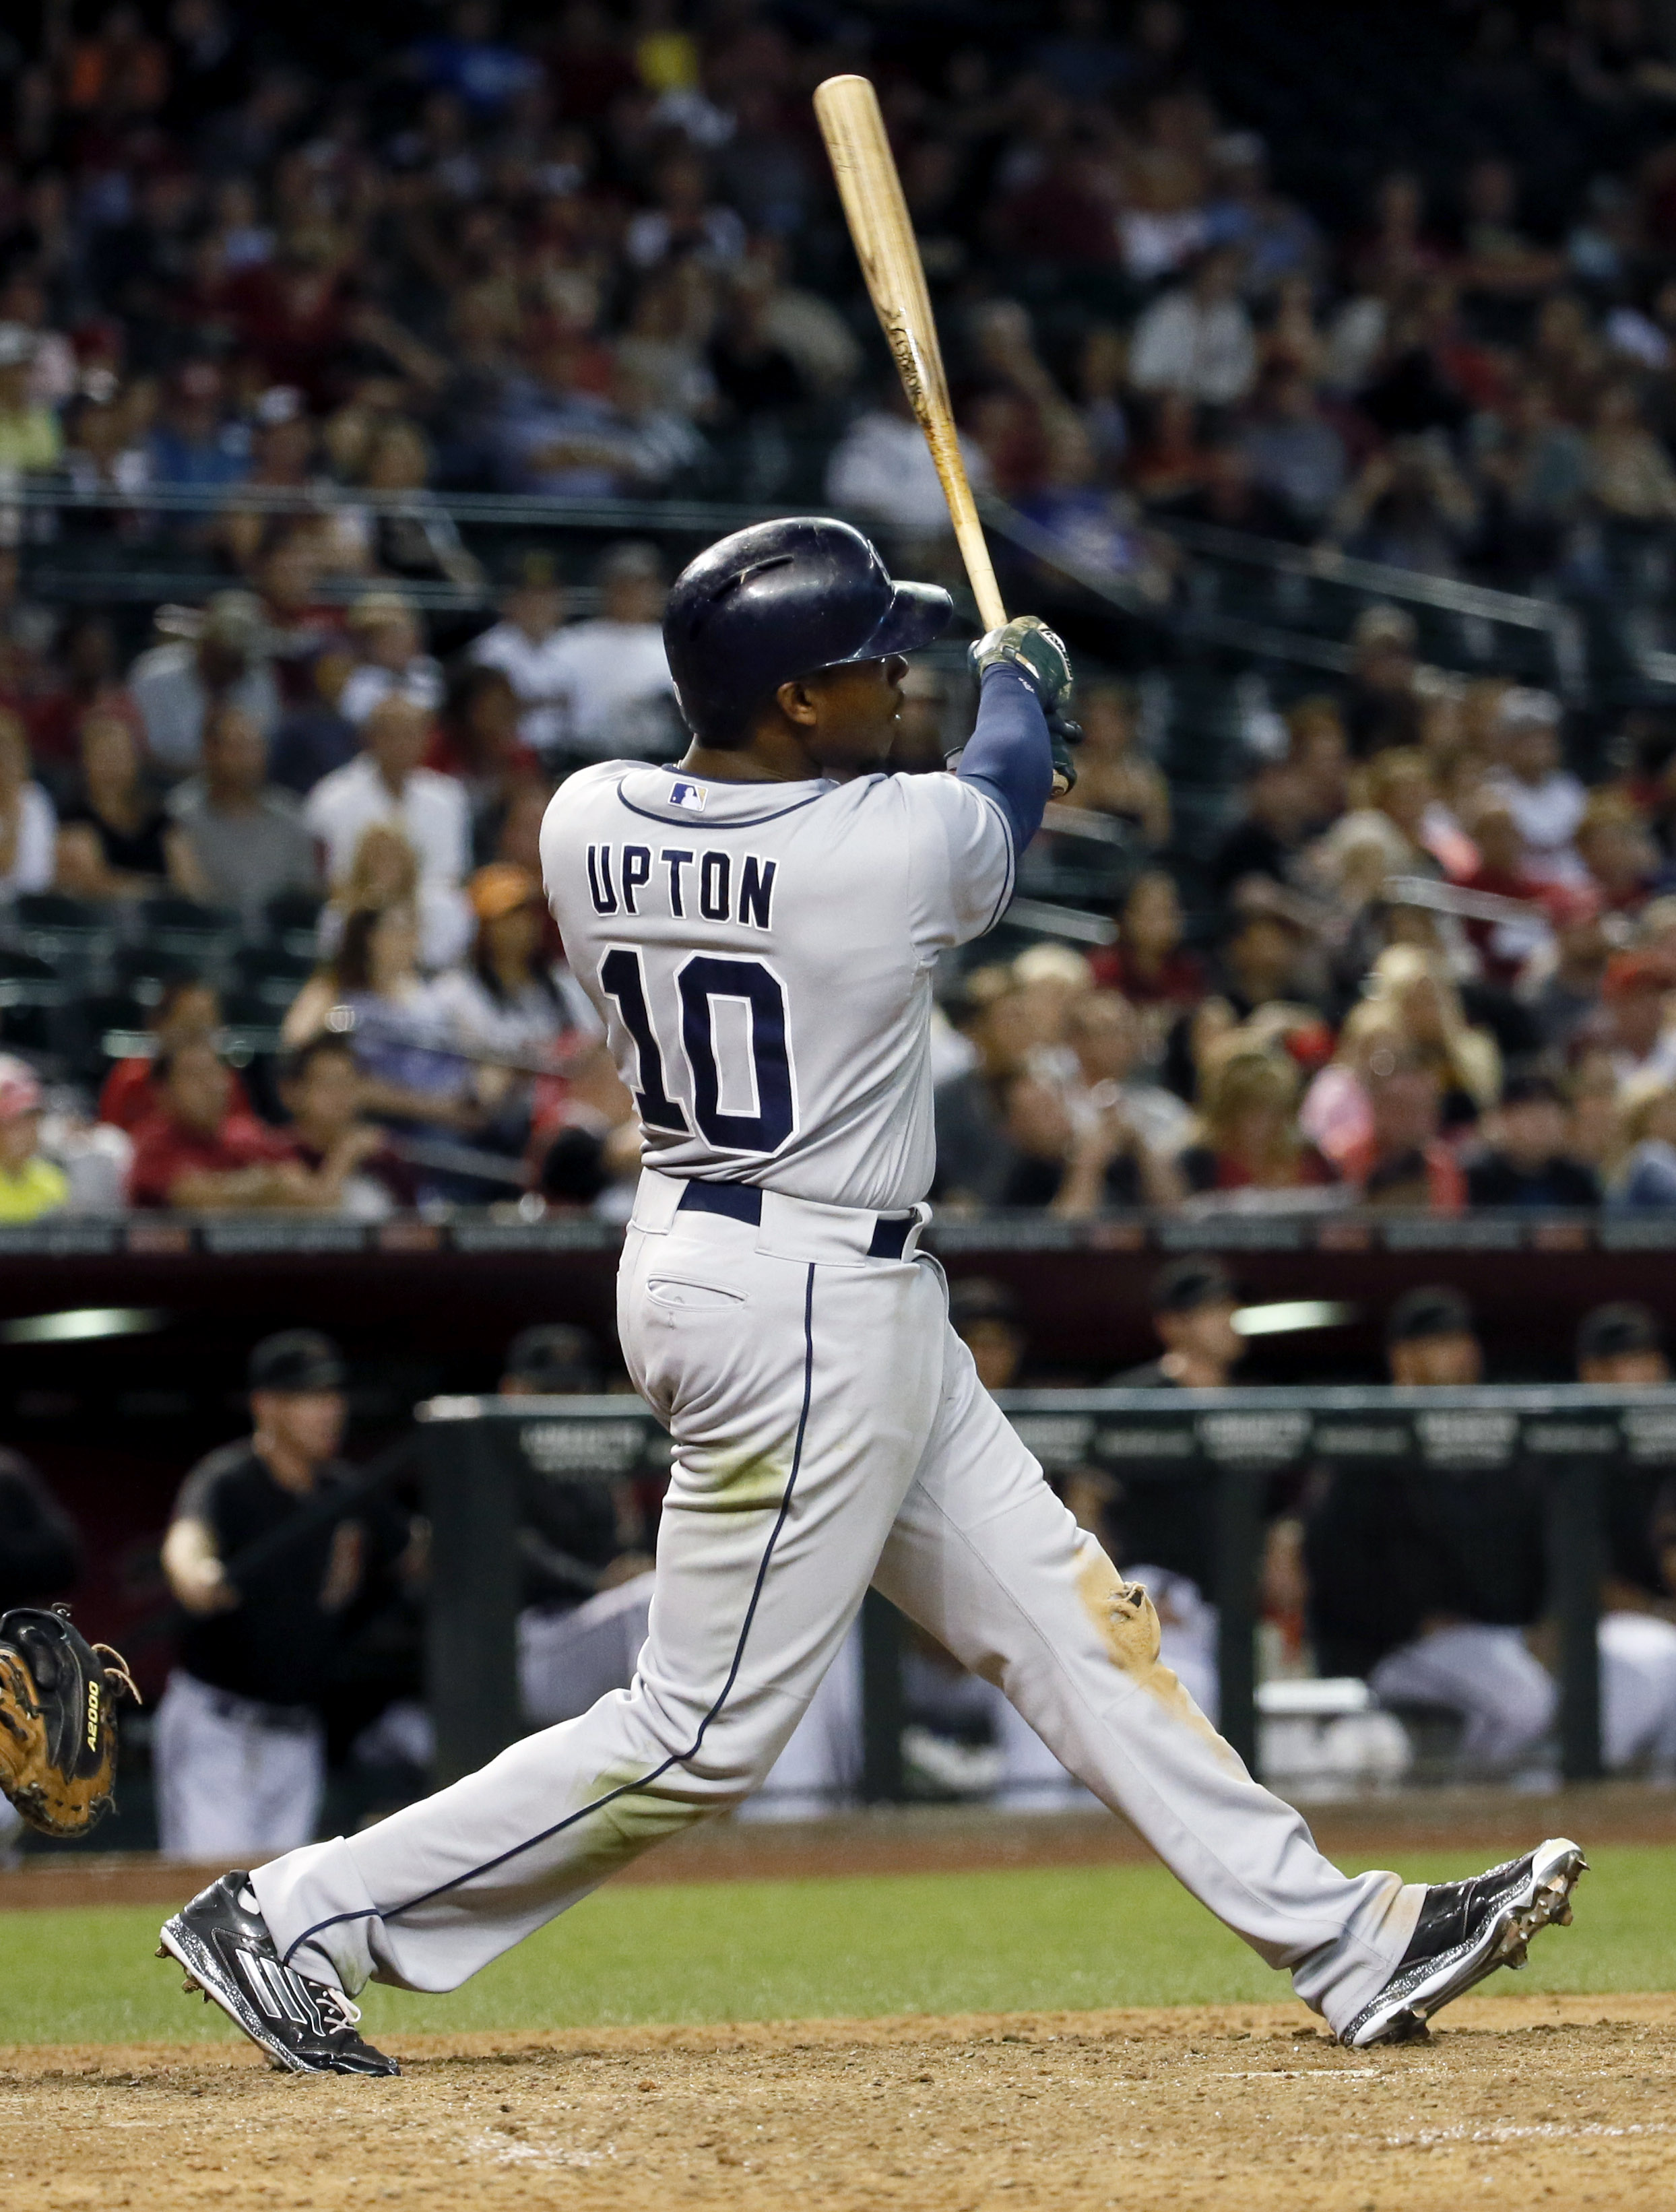 San Diego Padres' Justin Upton follows through on a solo home run against the Arizona Diamondbacks during the 12th inning of a baseball game, Saturday, May 9, 2015, in Phoenix. (AP Photo/Matt York)